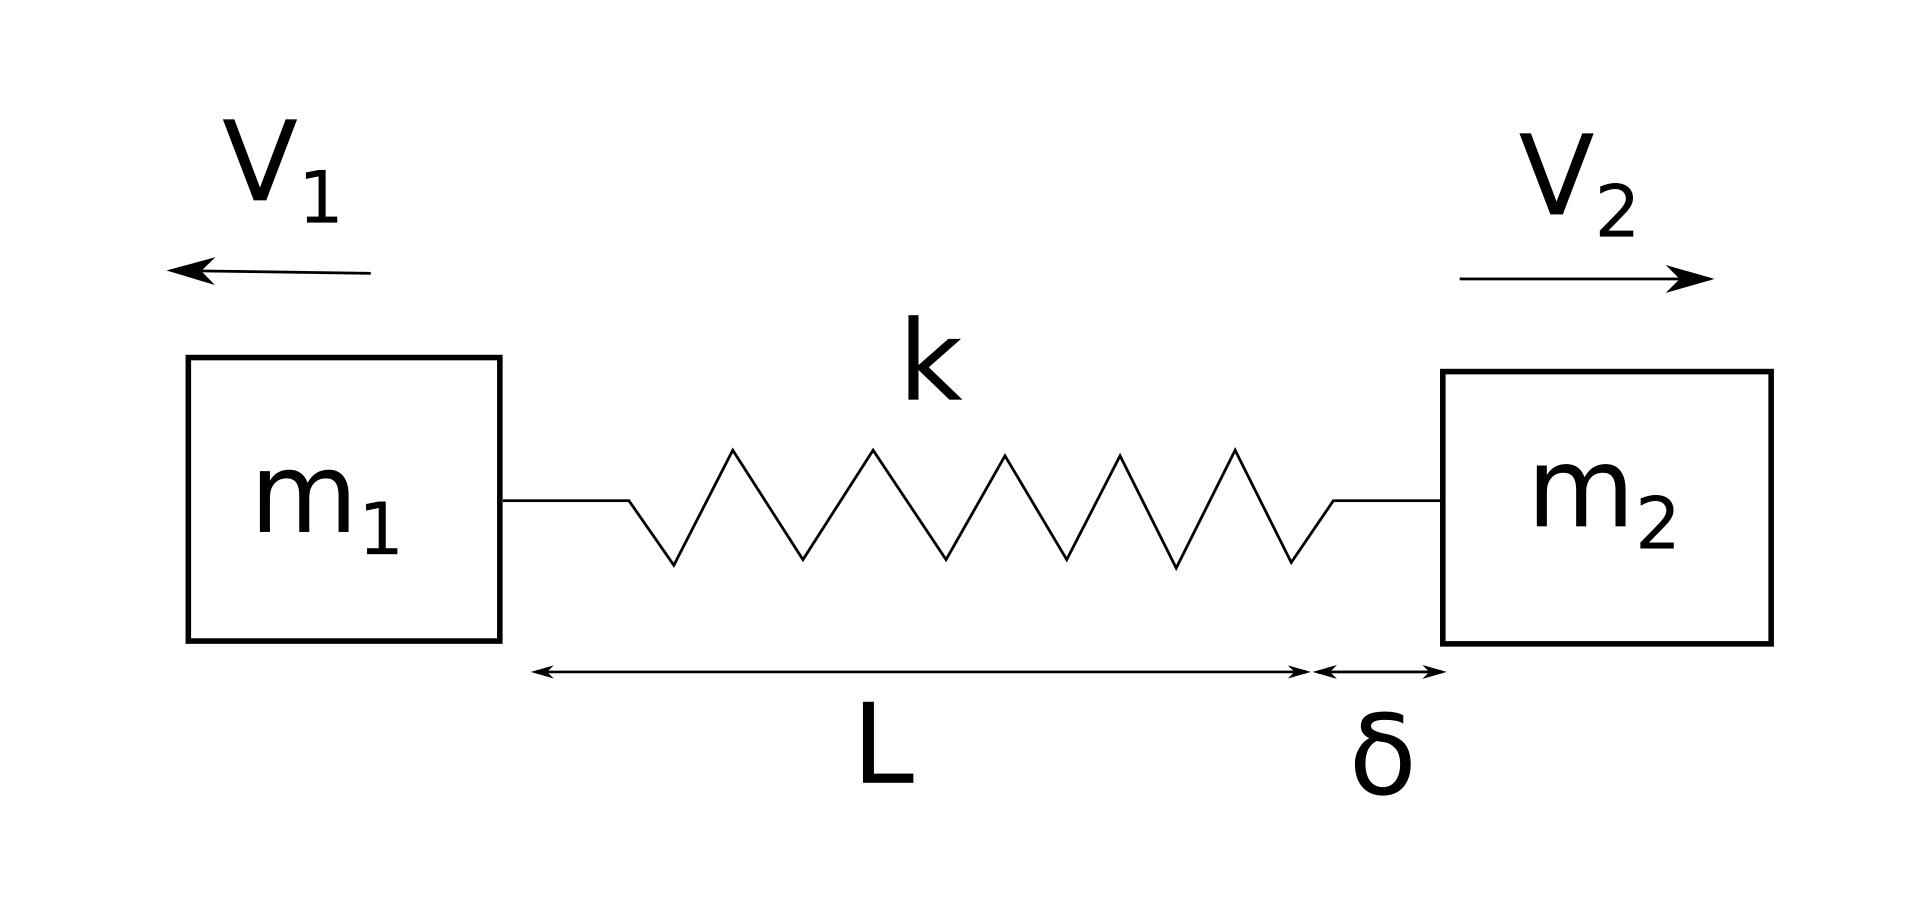 deceleration diagram